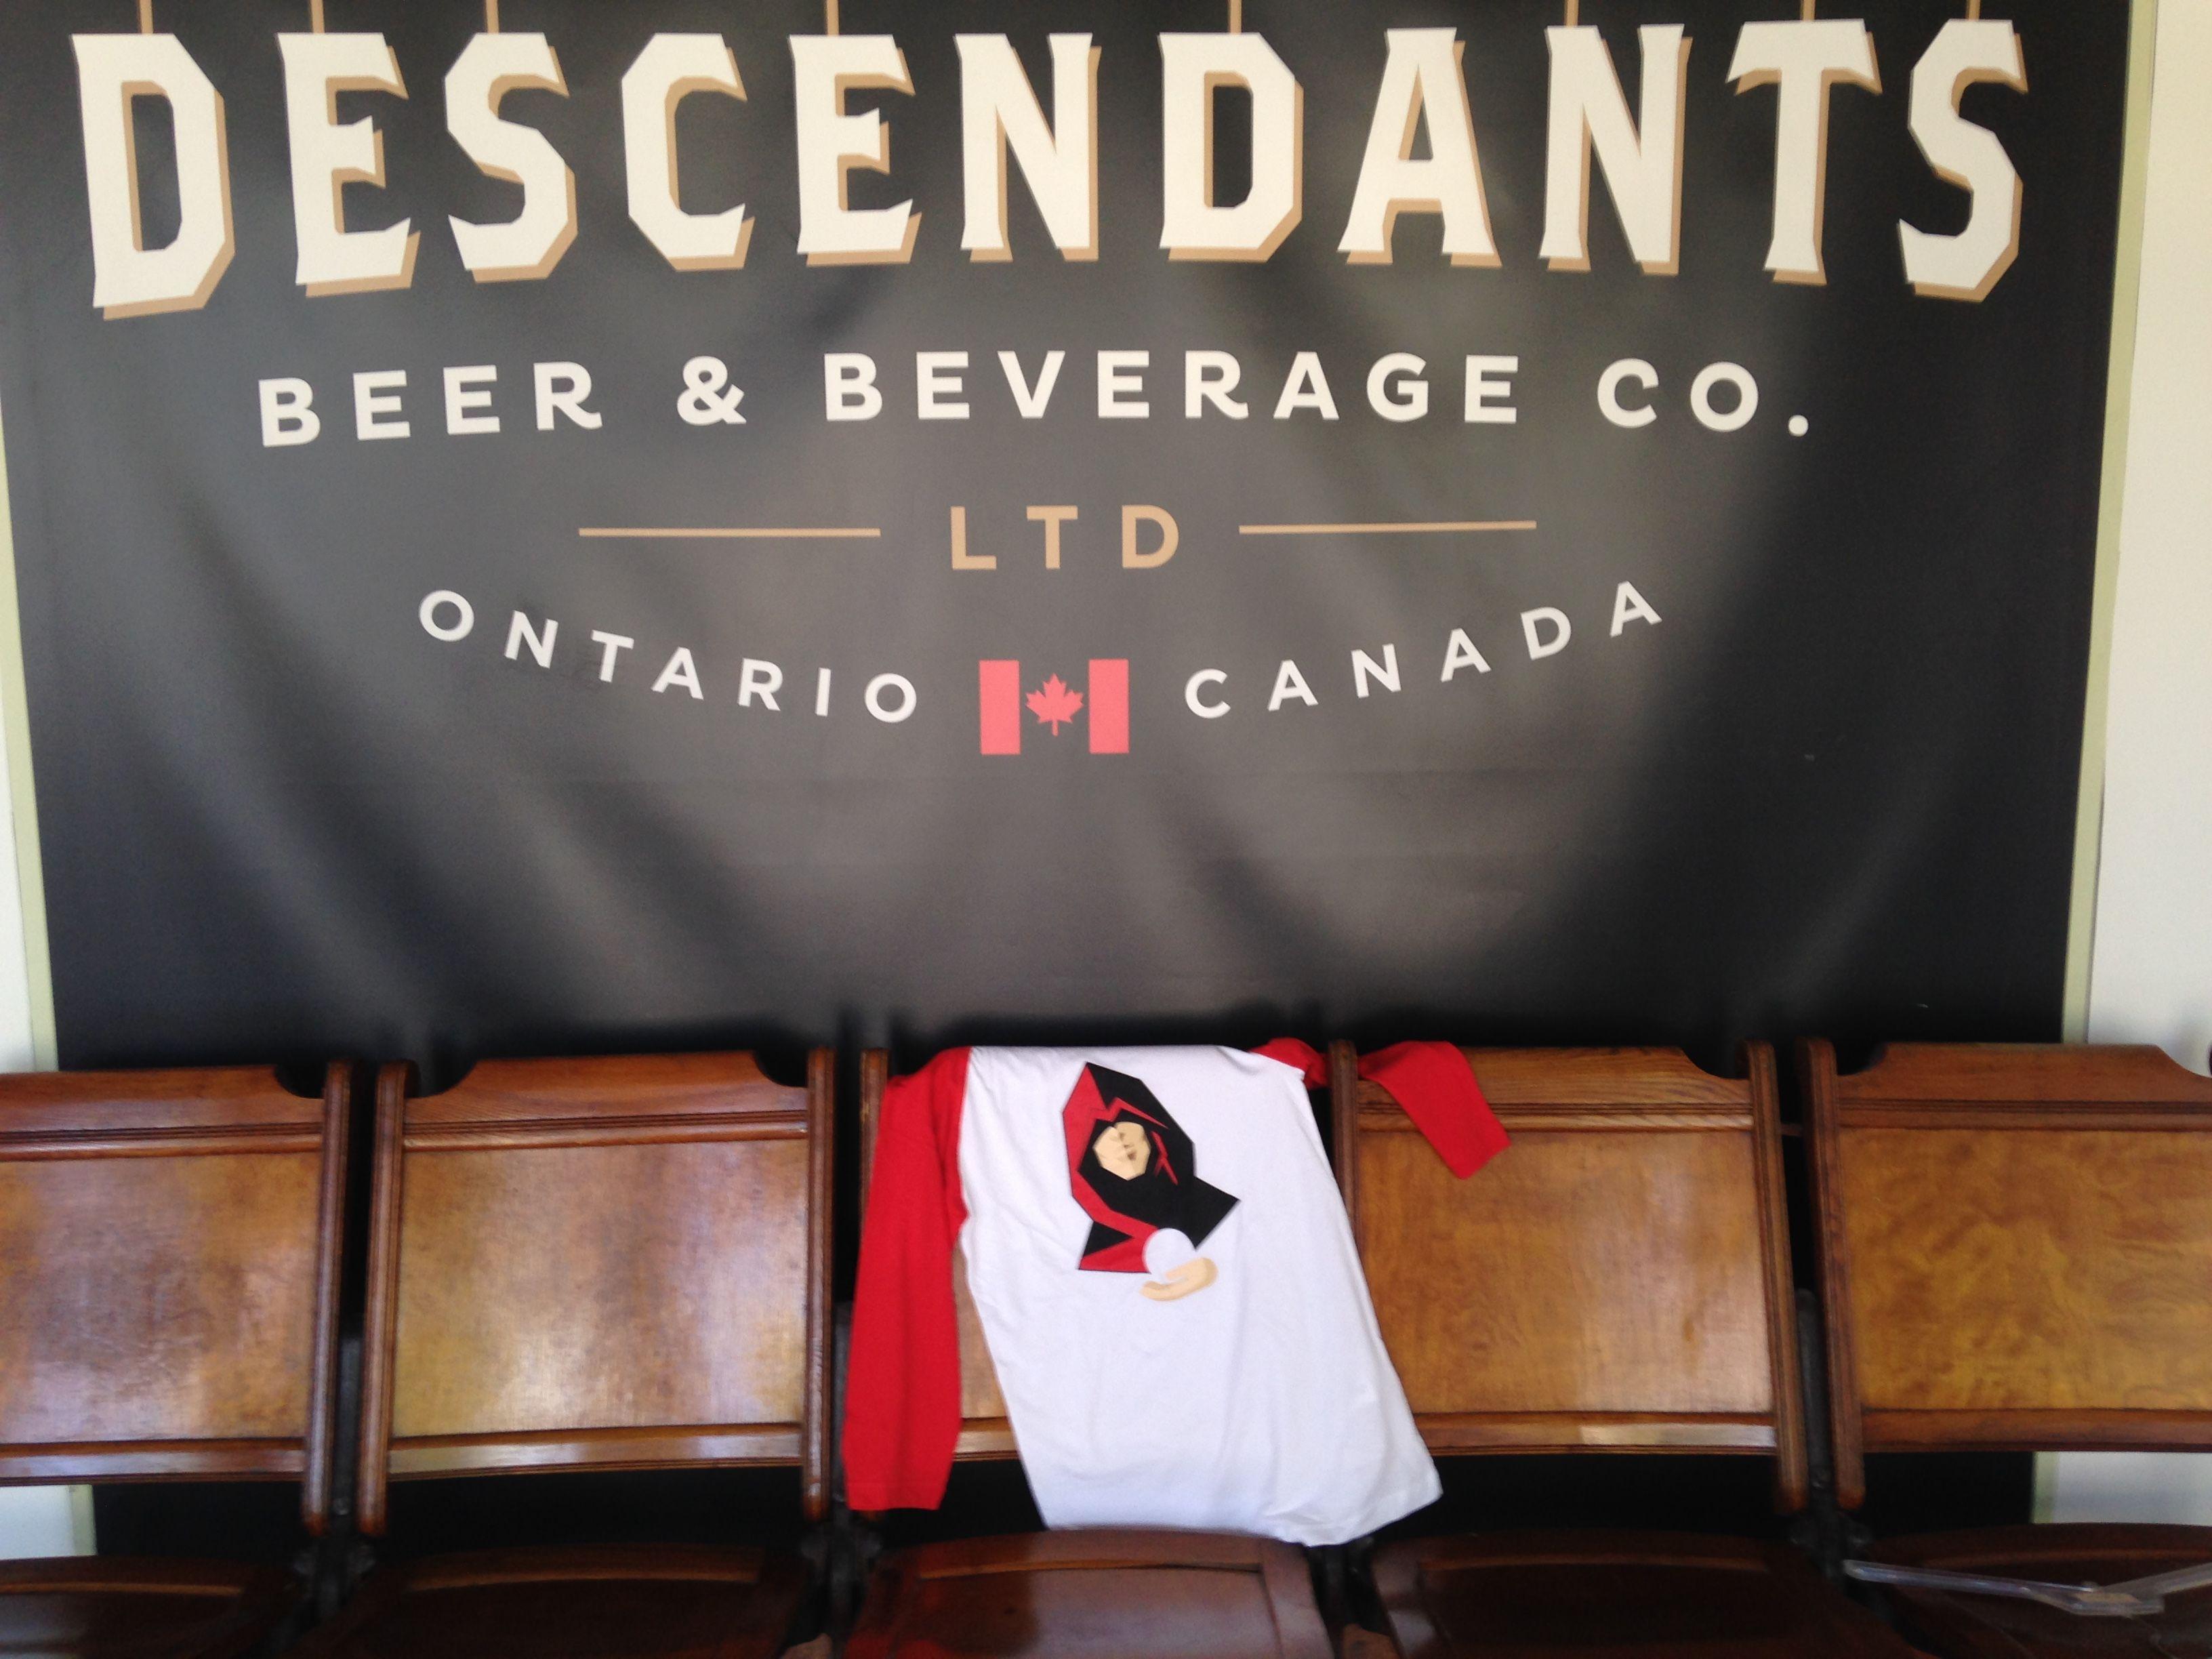 Antique Theatre Chairs at Descendants Beer & Beverage Co